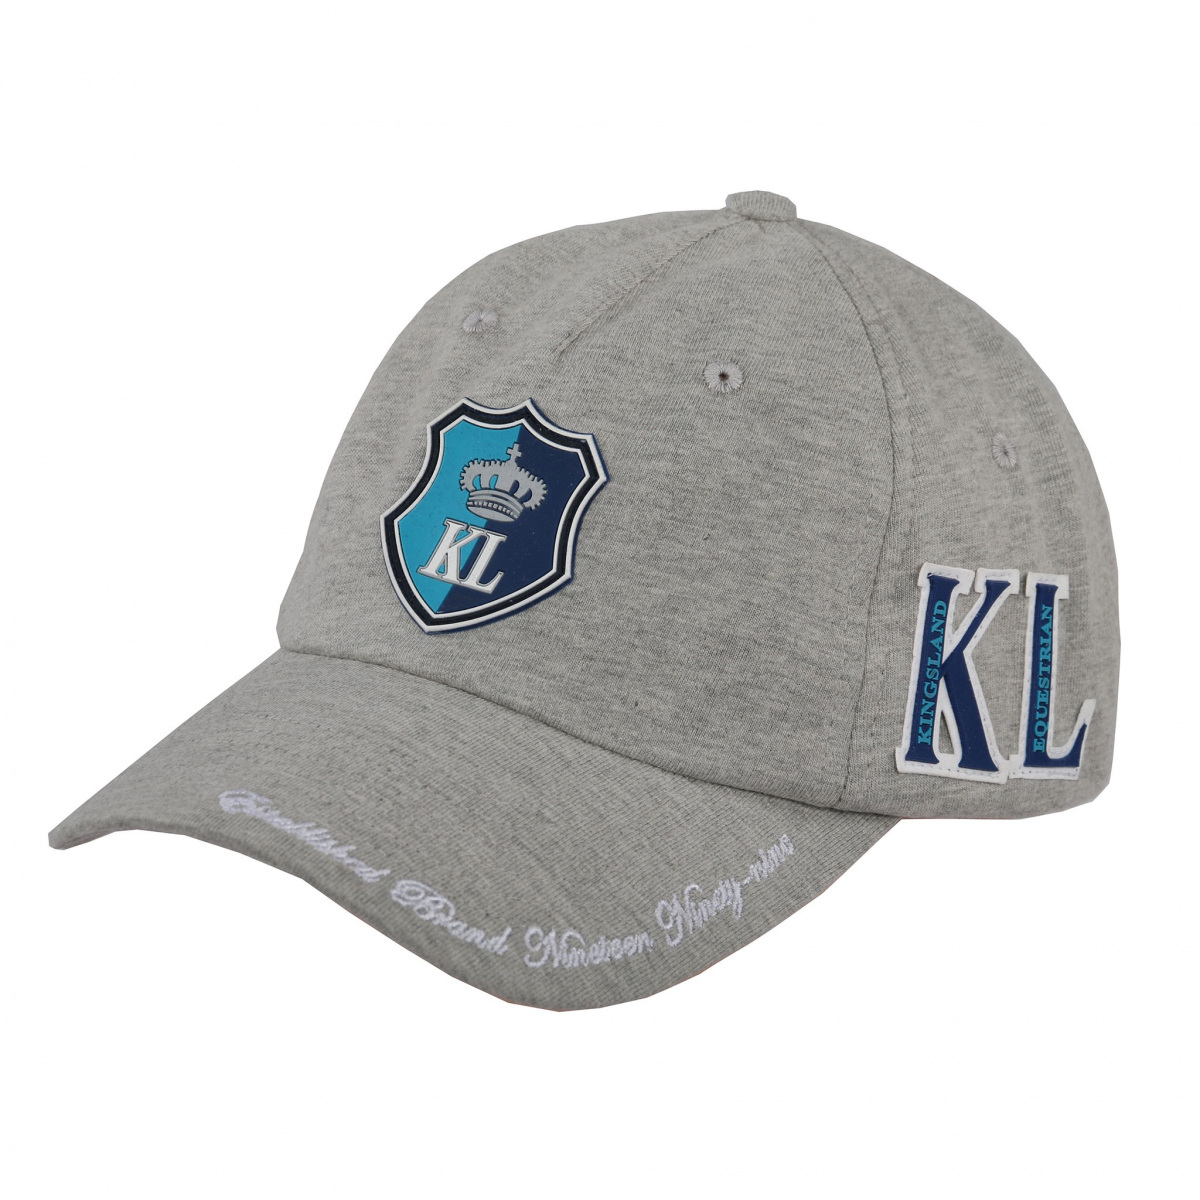 Kingsland Del Cavo Unisex Cap